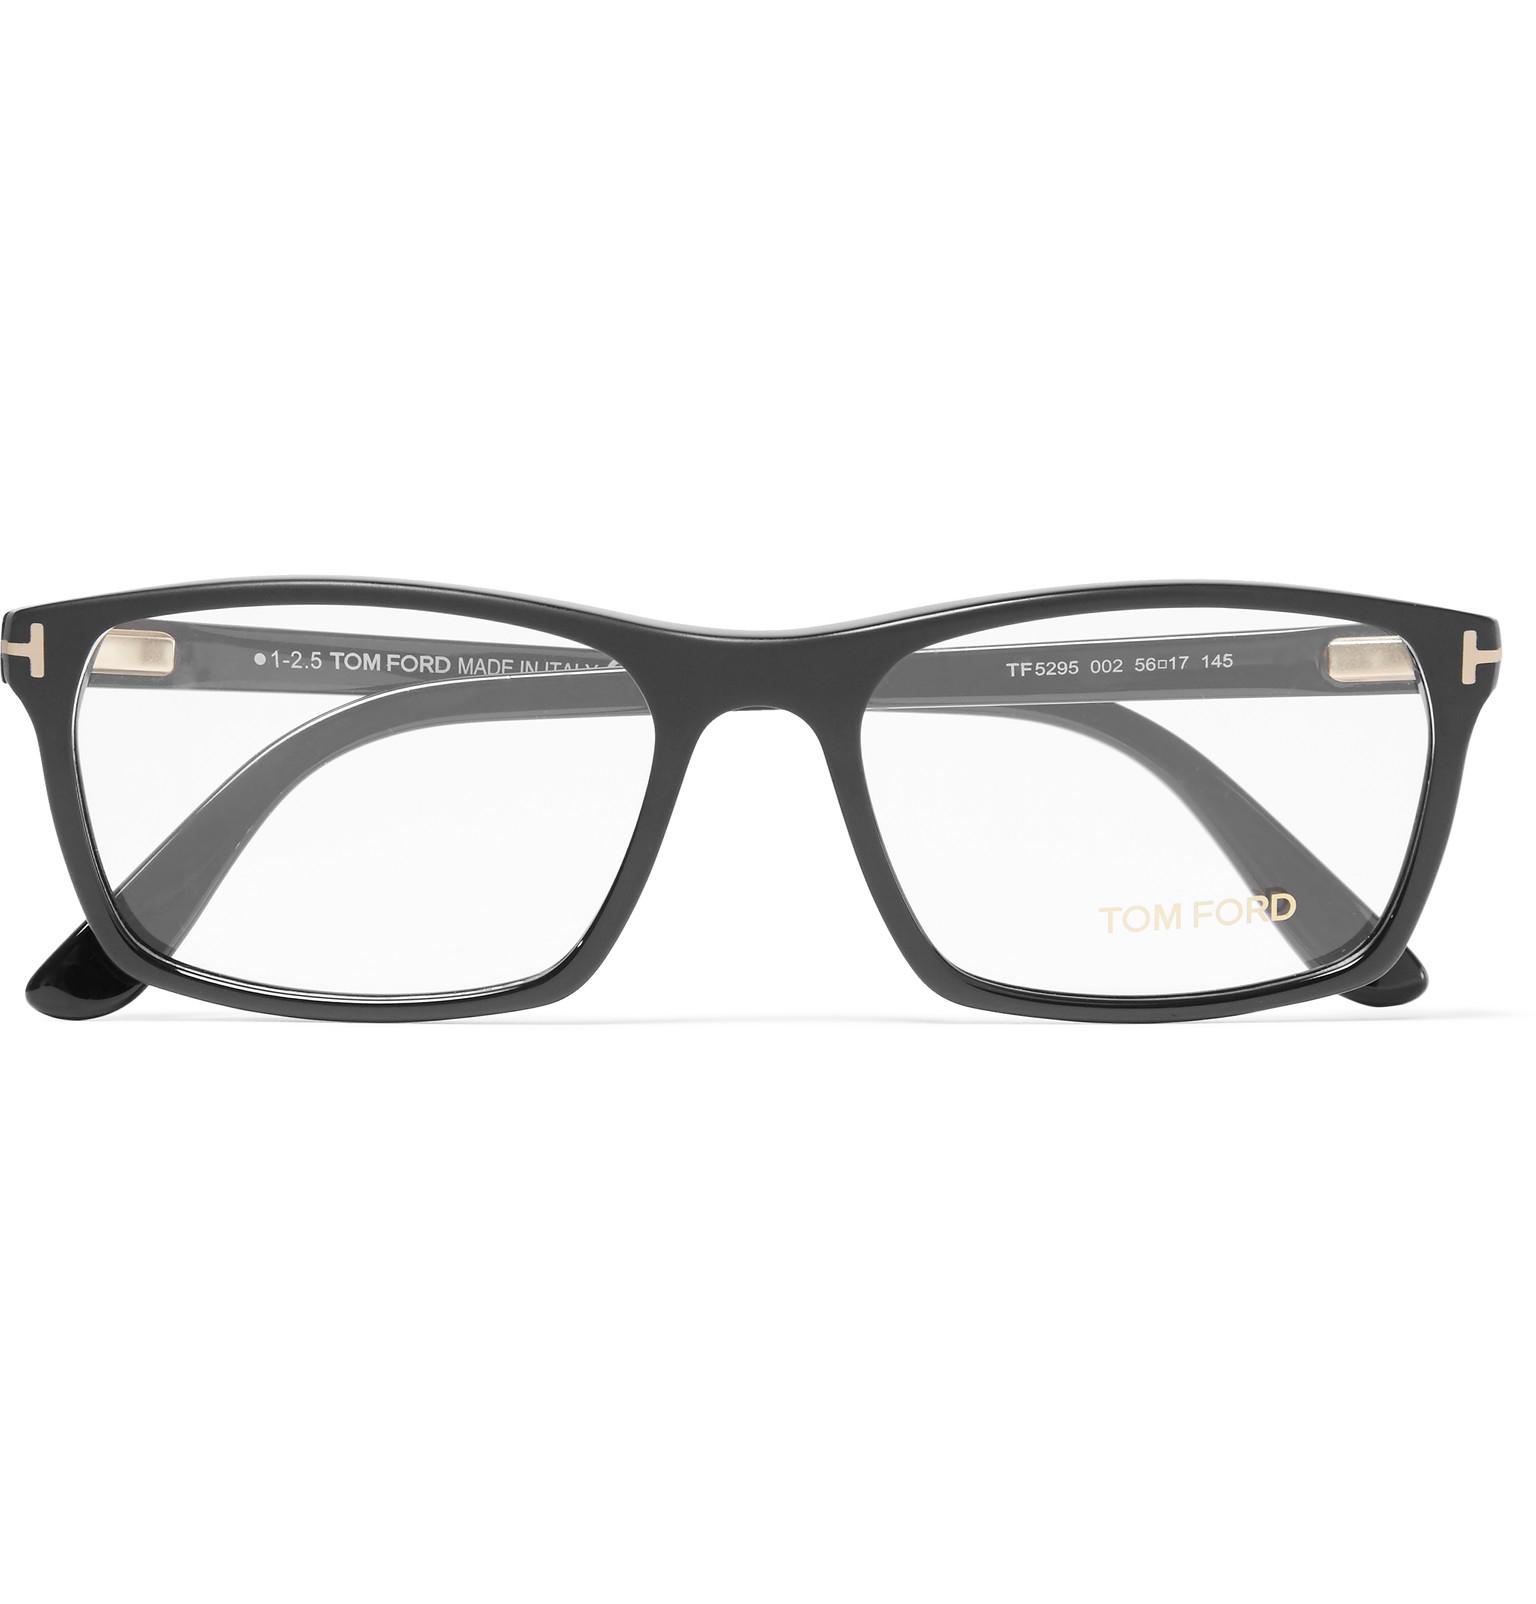 Tom ford Square-frame Matte-acetate Optical Glasses in ...